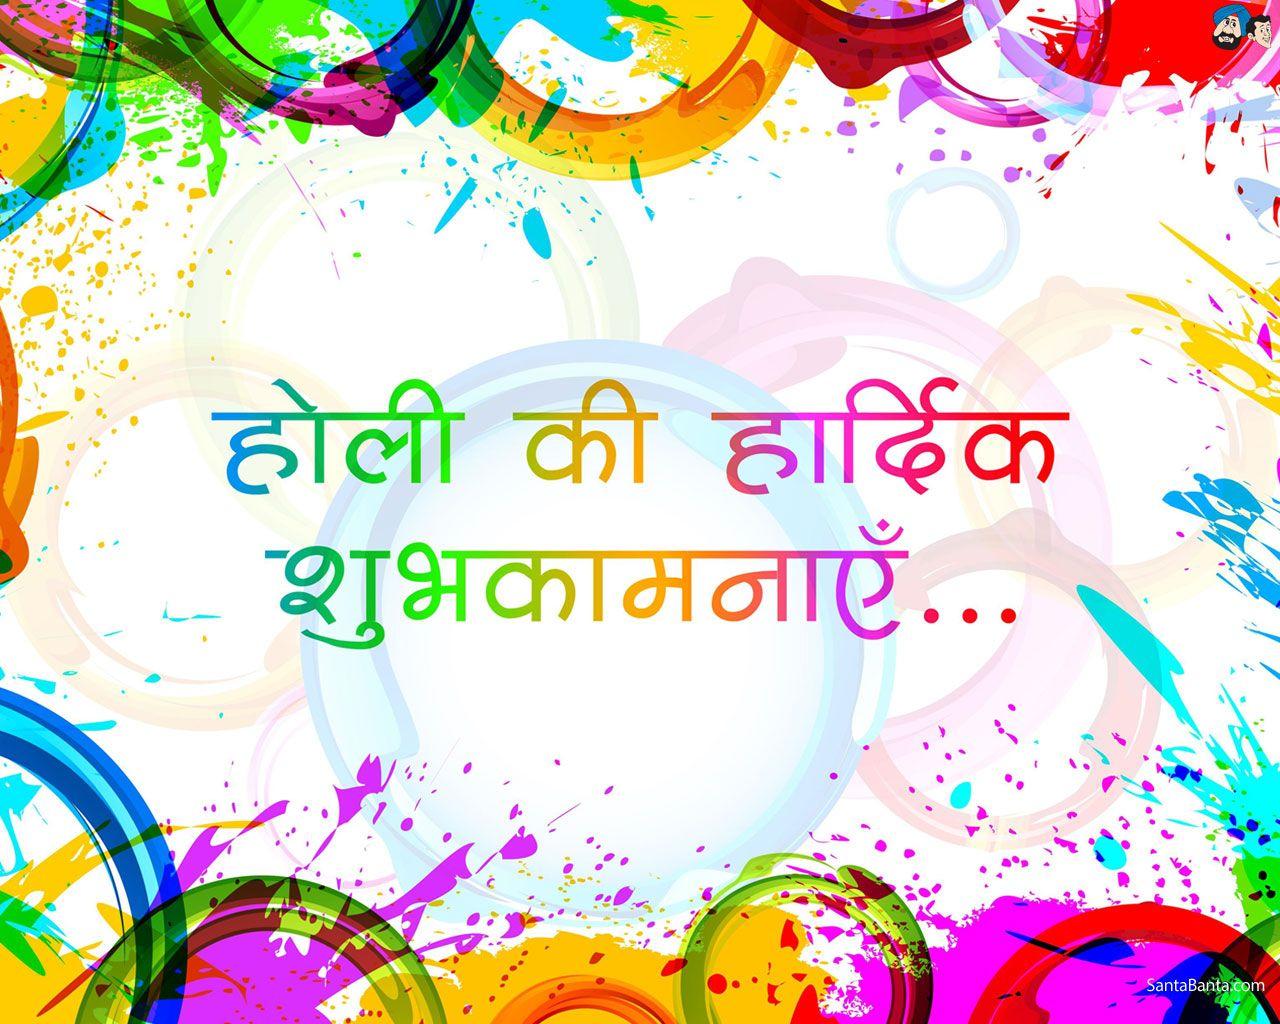 santa banta happy holi